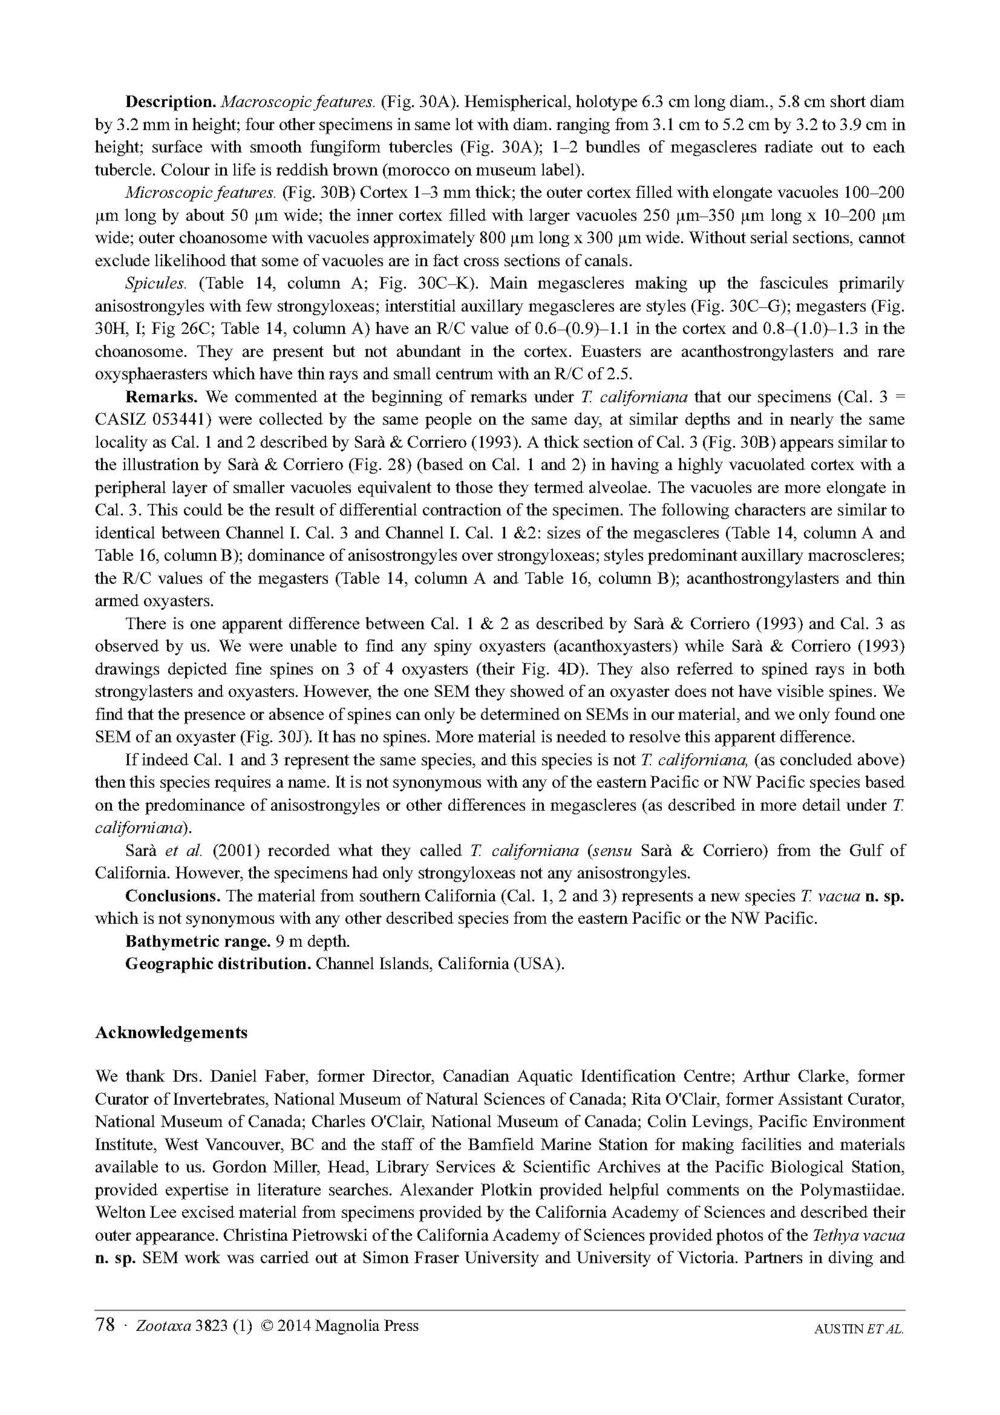 Austin et al 2014 NE Pacific Hadromerids_Page_78.jpg